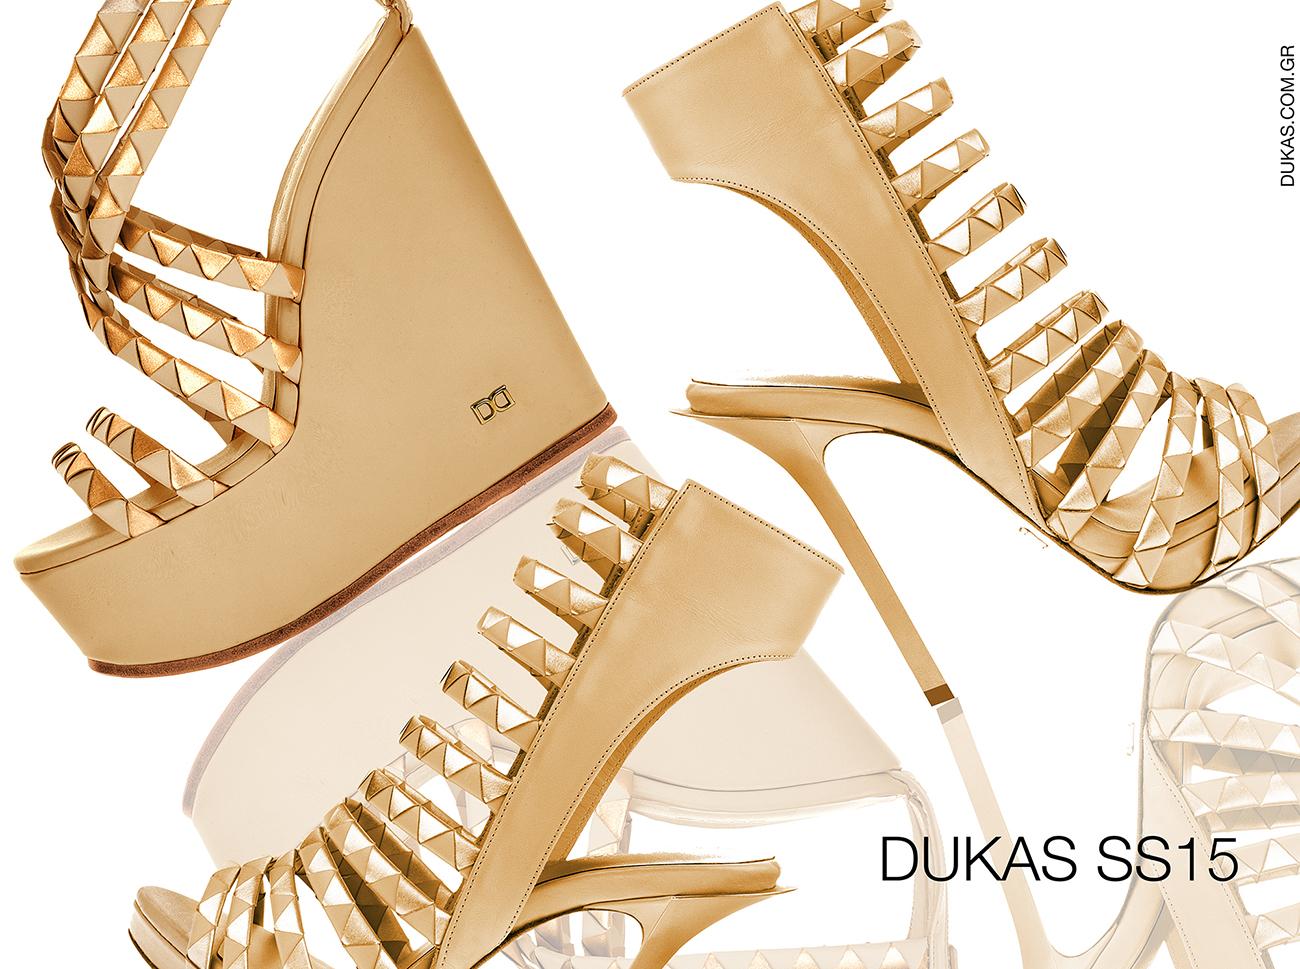 66e4cb23f44 Όλα Για Τις Γυναίκες: DUKAS SS15: Η νέα συλλογή παπουτσιών του Δούκα ...